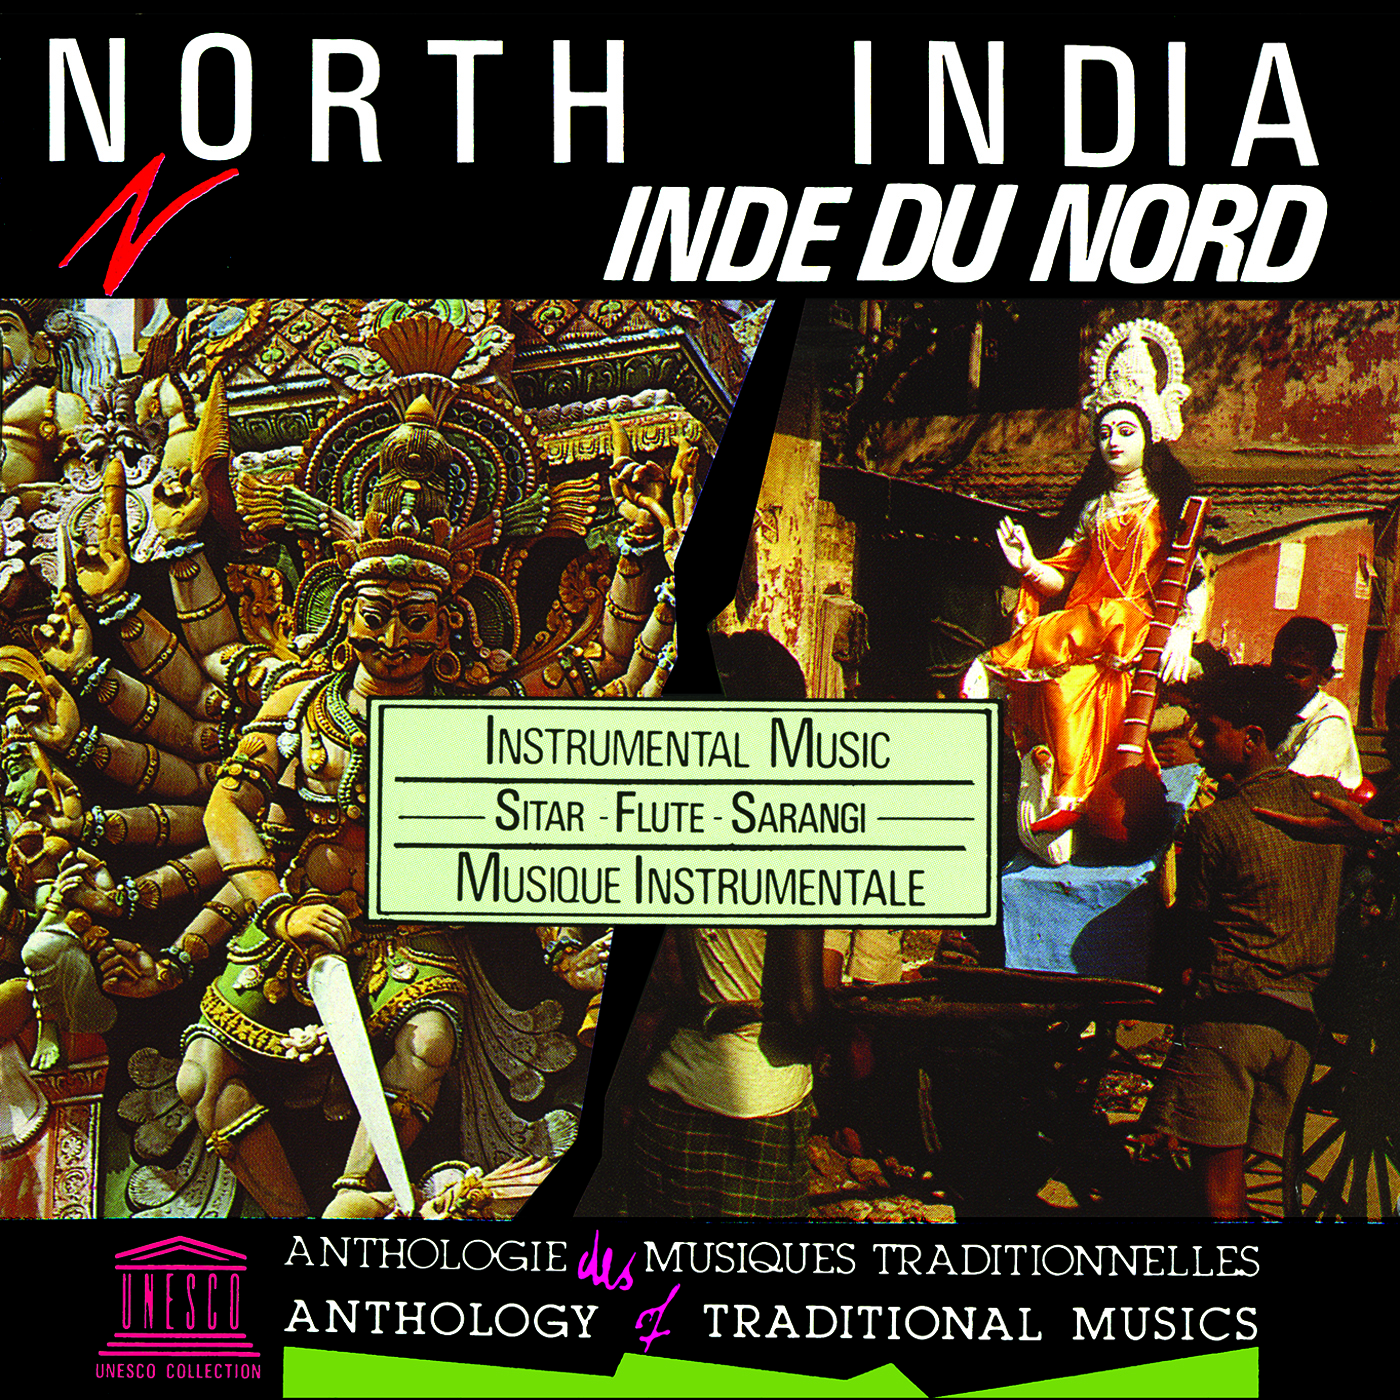 North India: Instrumental Music - Sitar, Flute, Sarangi